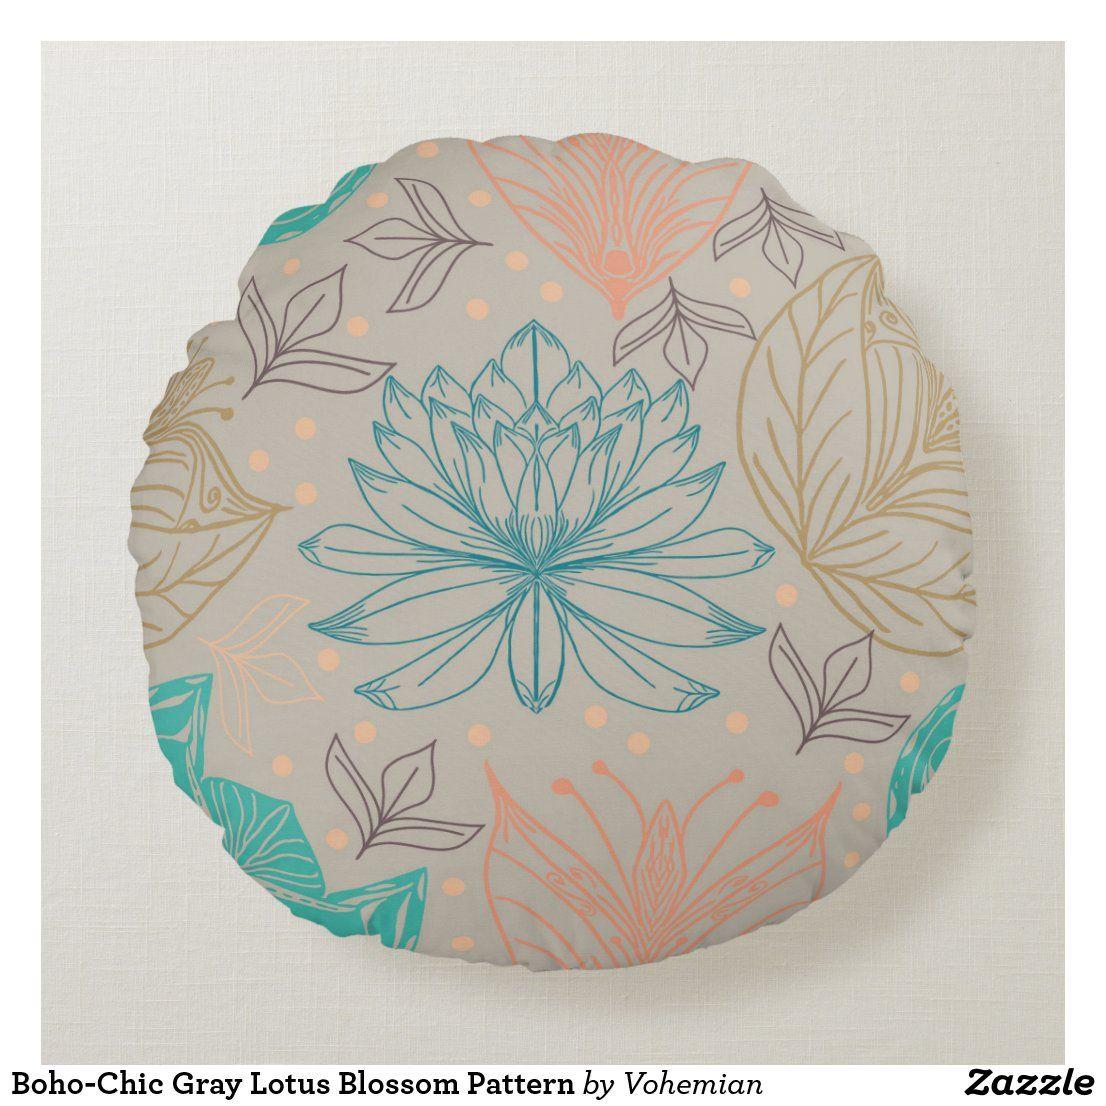 Boho-Chic Gray Lotus Blossom Pattern Round Pillow